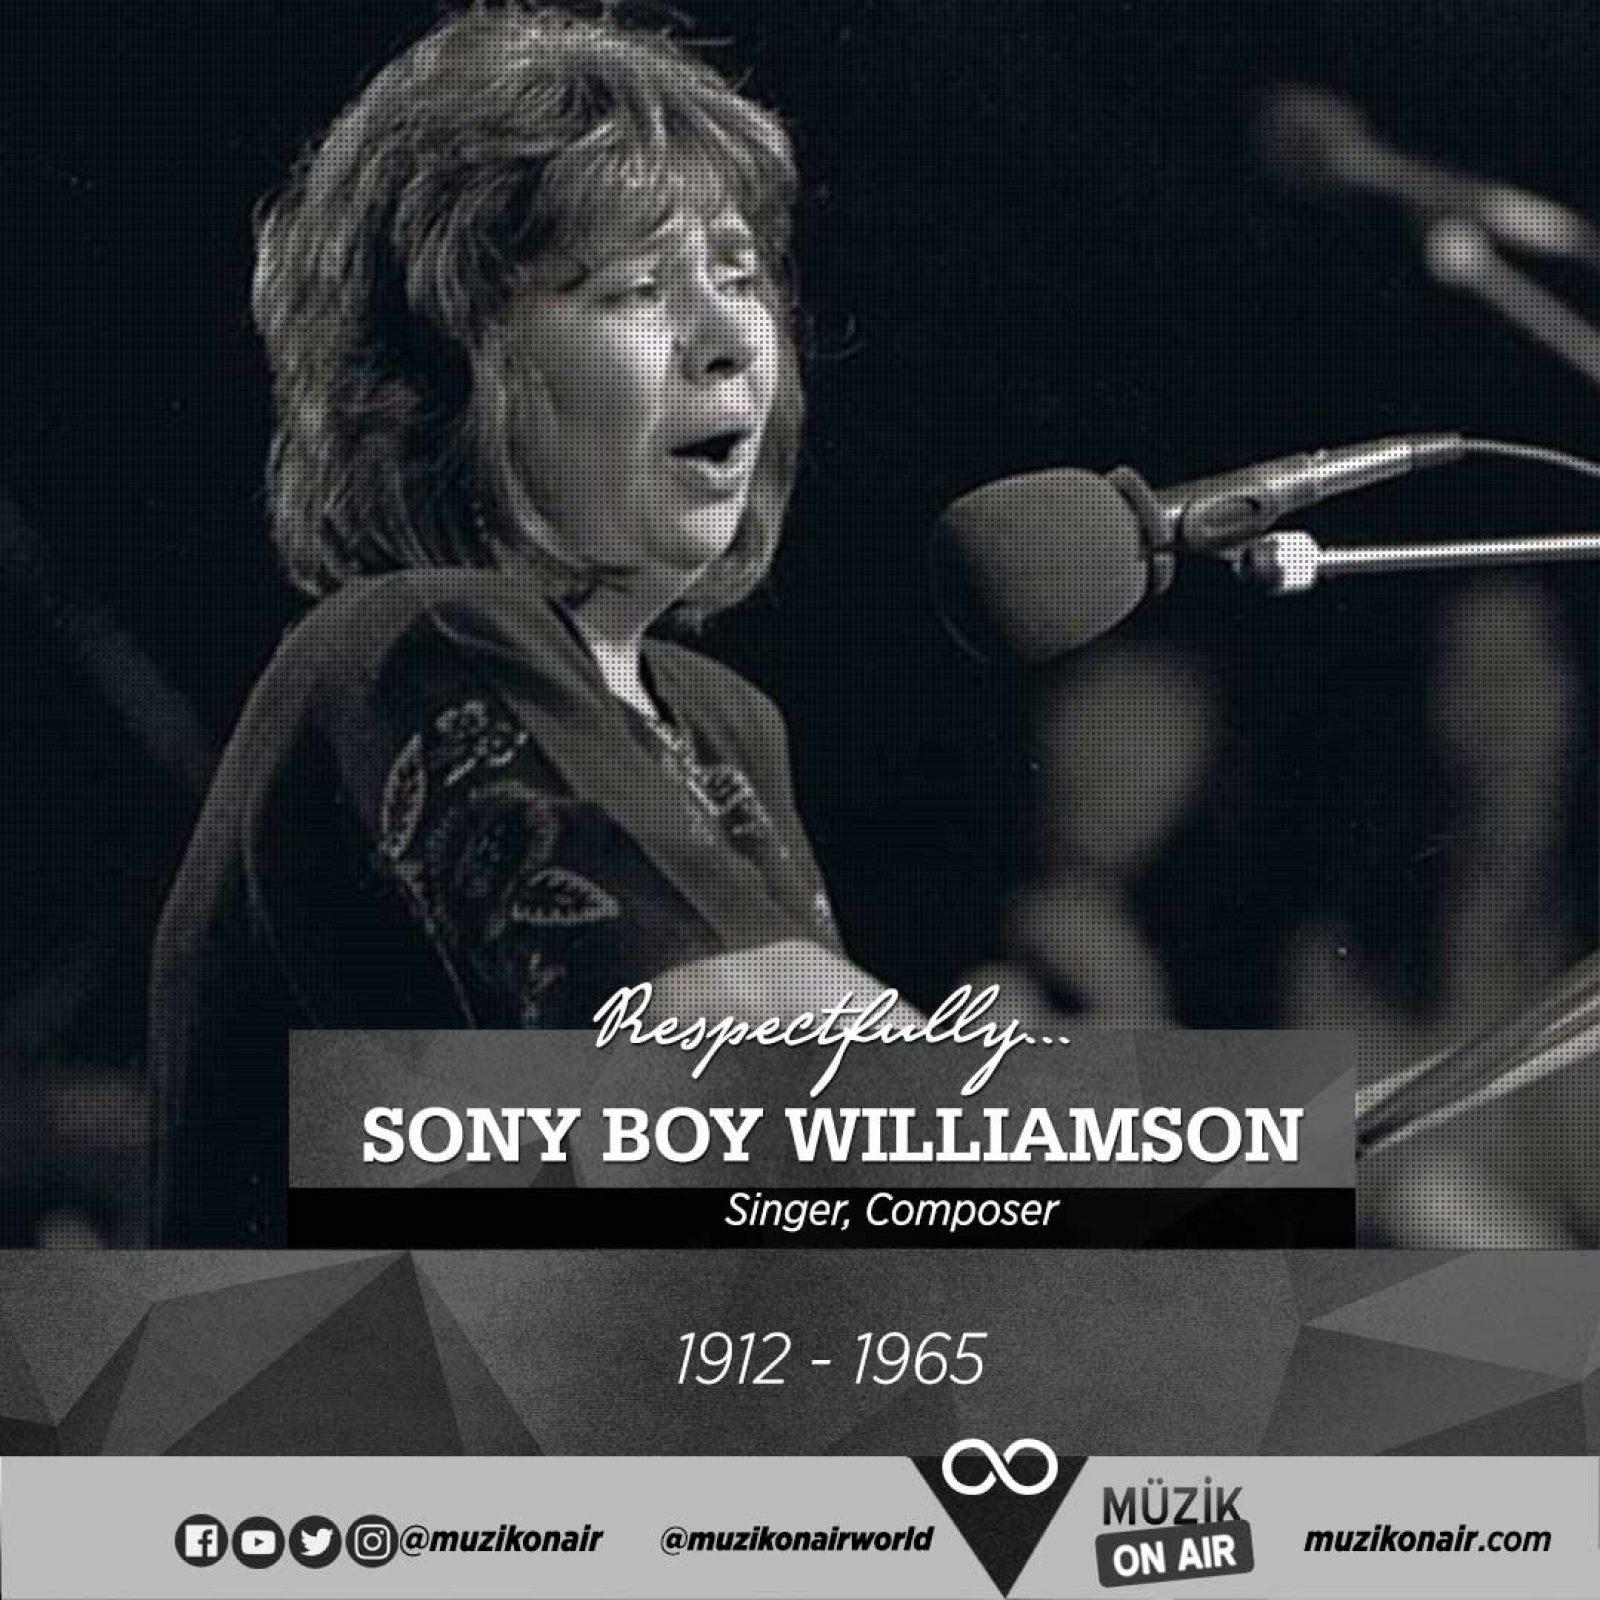 dgk-anma-sonny-boy-williamson